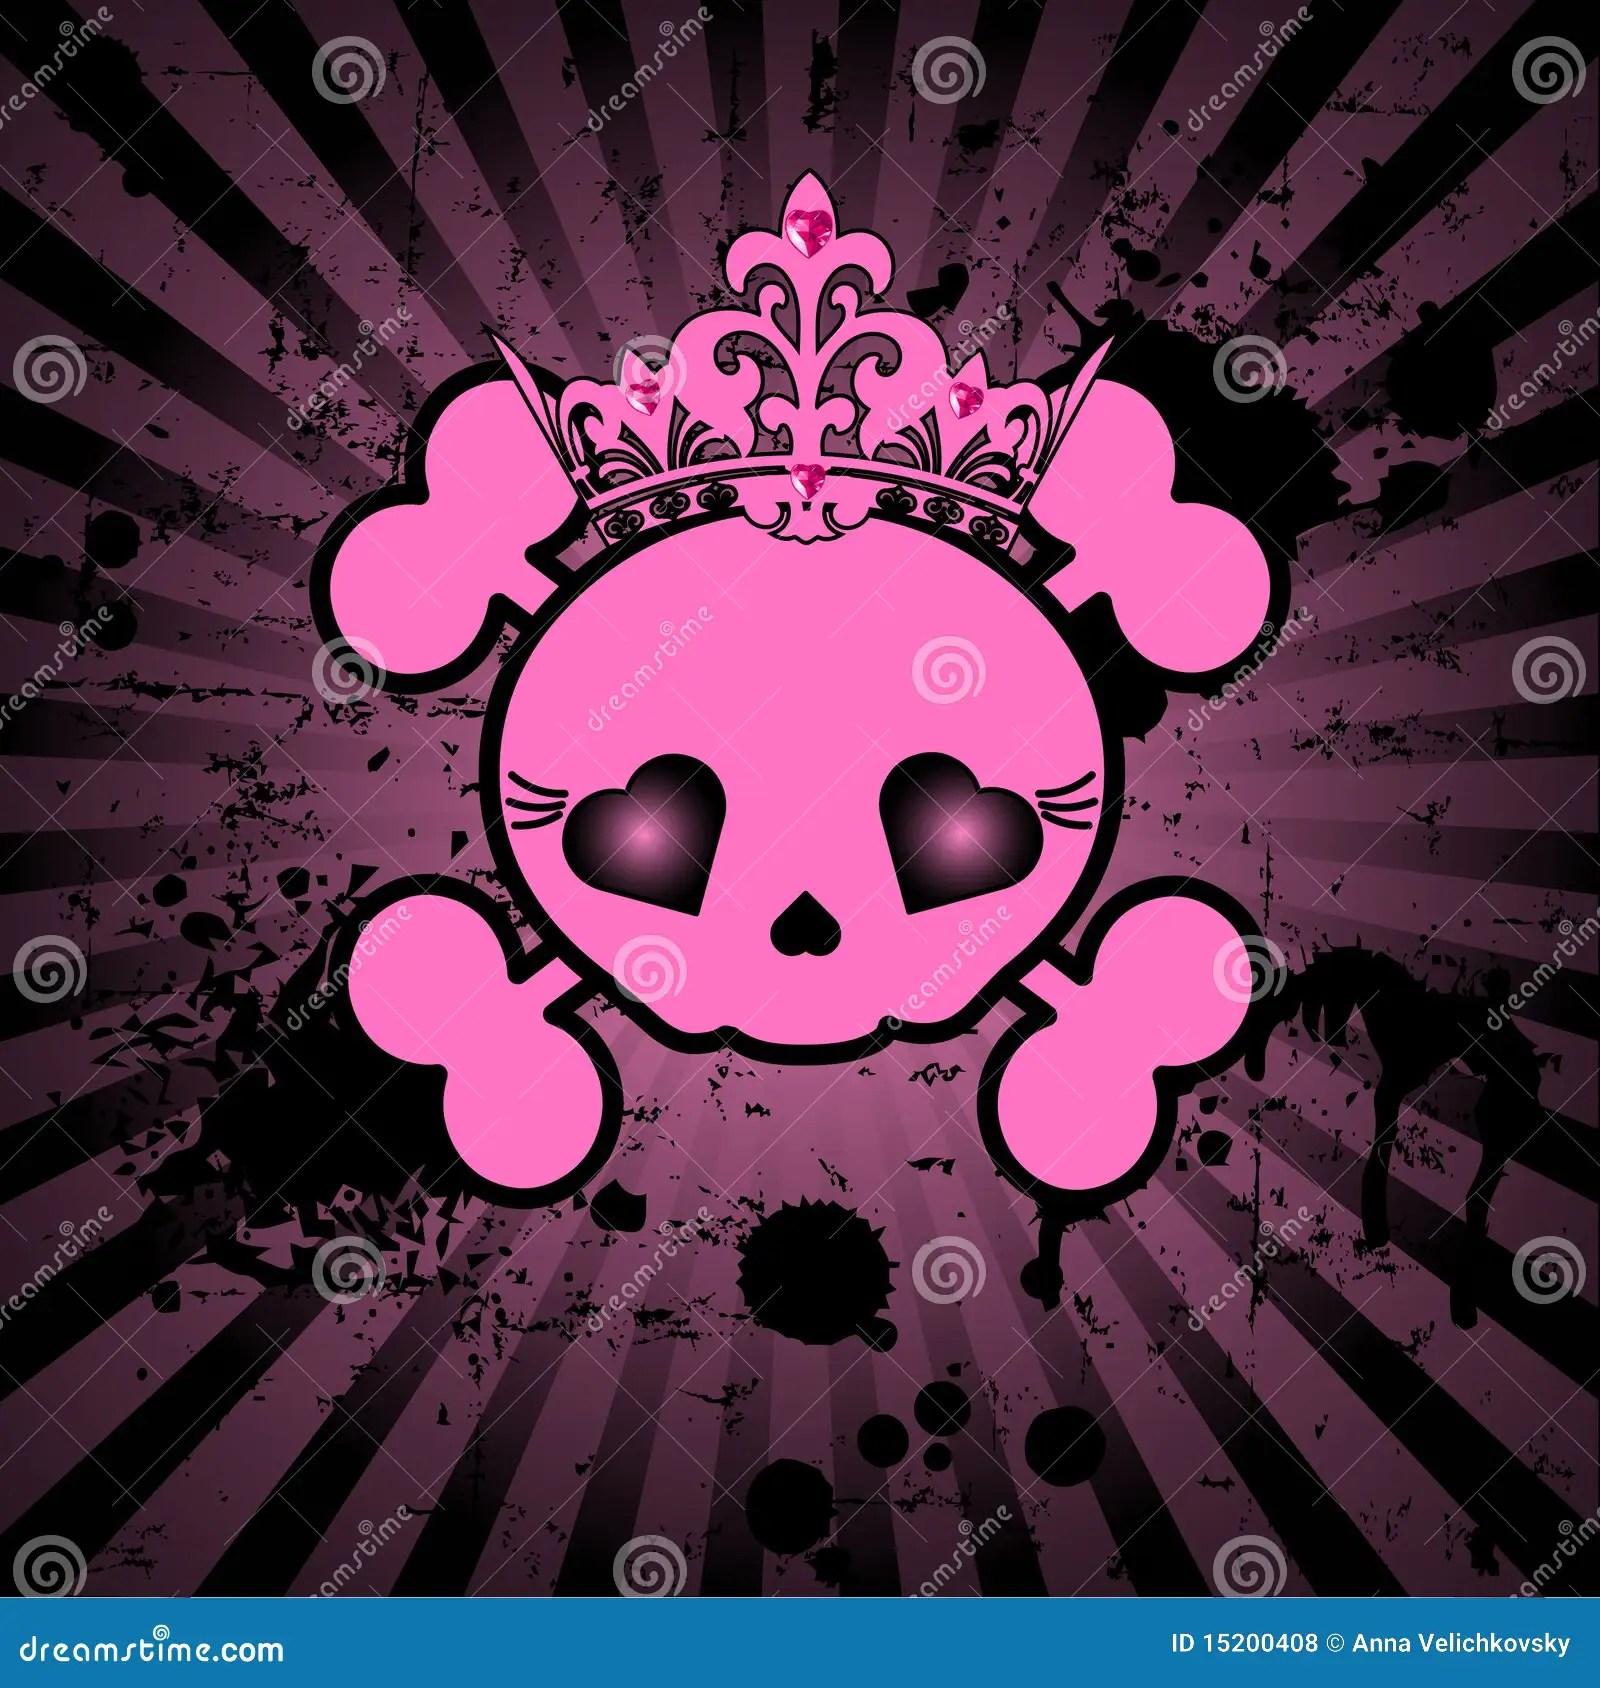 Cute Skeleton Girl Wallpaper Cute Skull With Crown Stock Vector Illustration Of